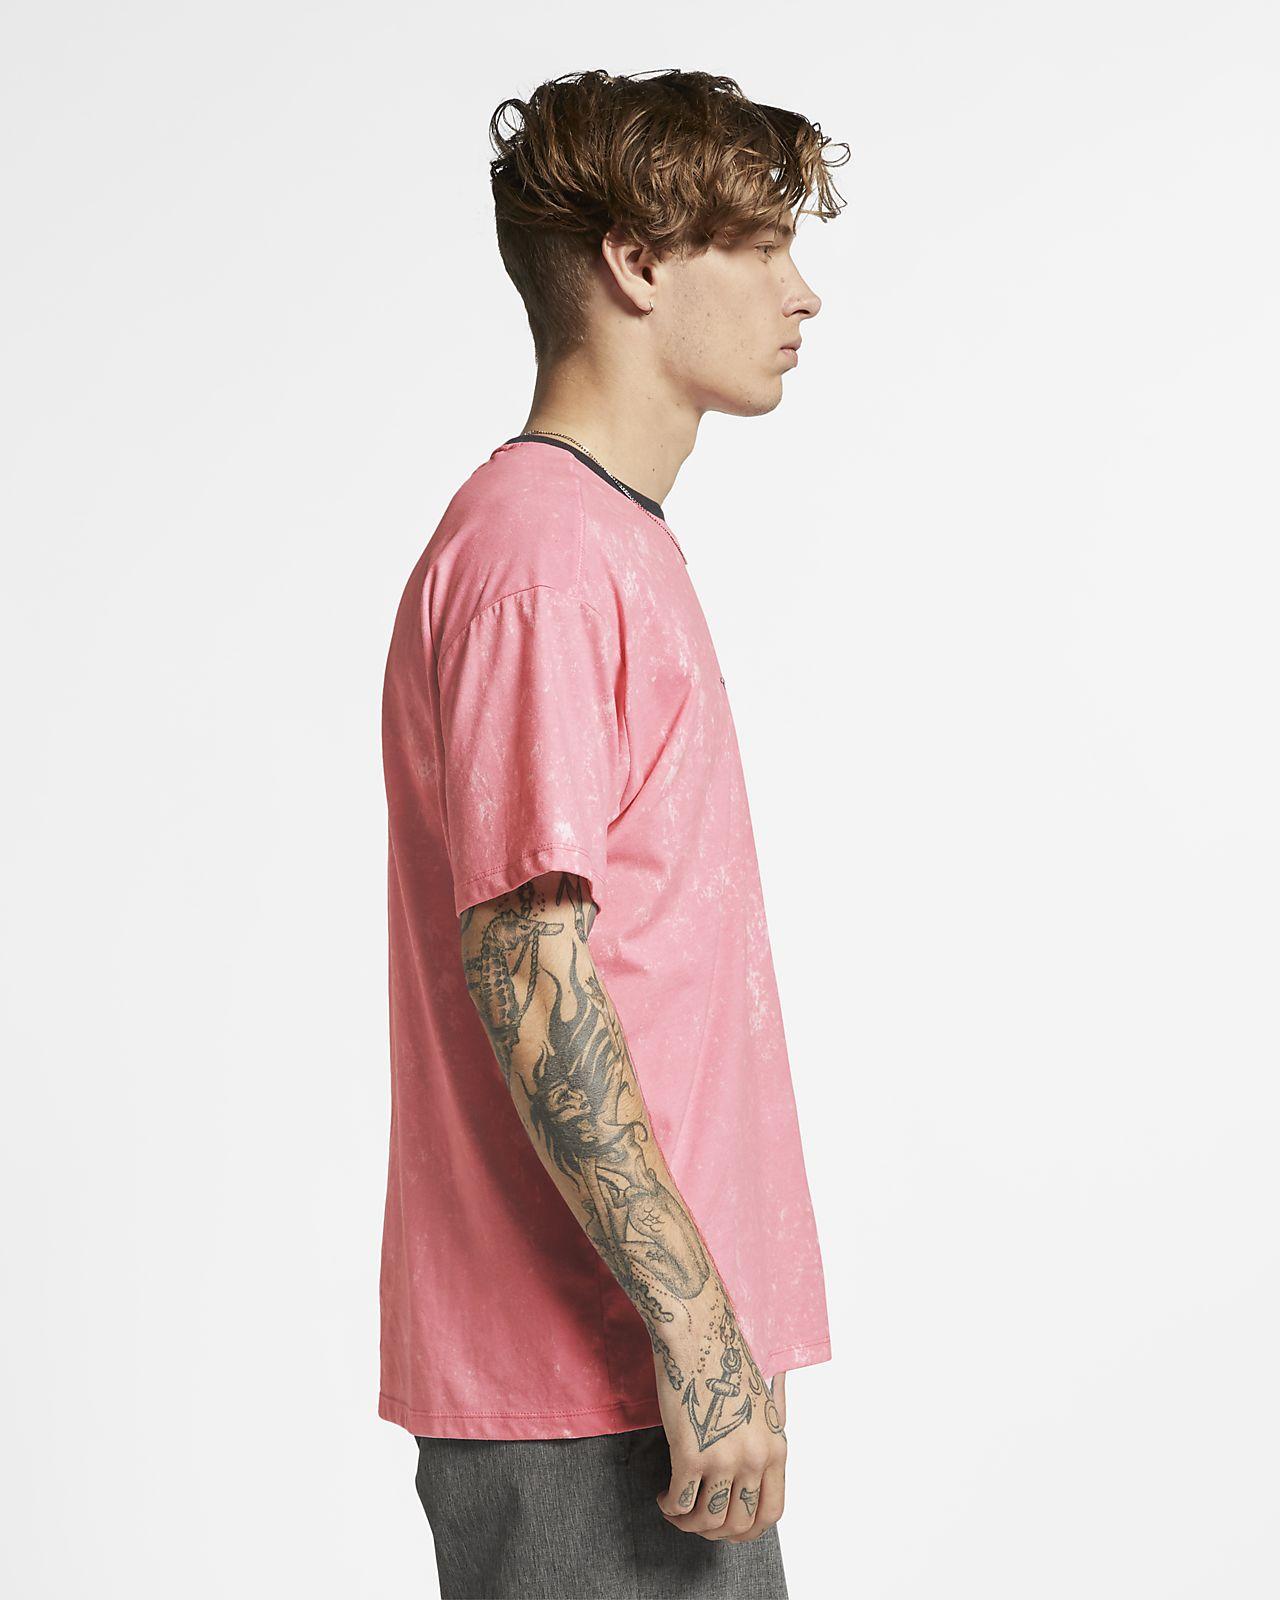 8b37dd487 Hurley Dri-FIT Harvey Casbah Men's Short-Sleeve Shirt. Nike.com